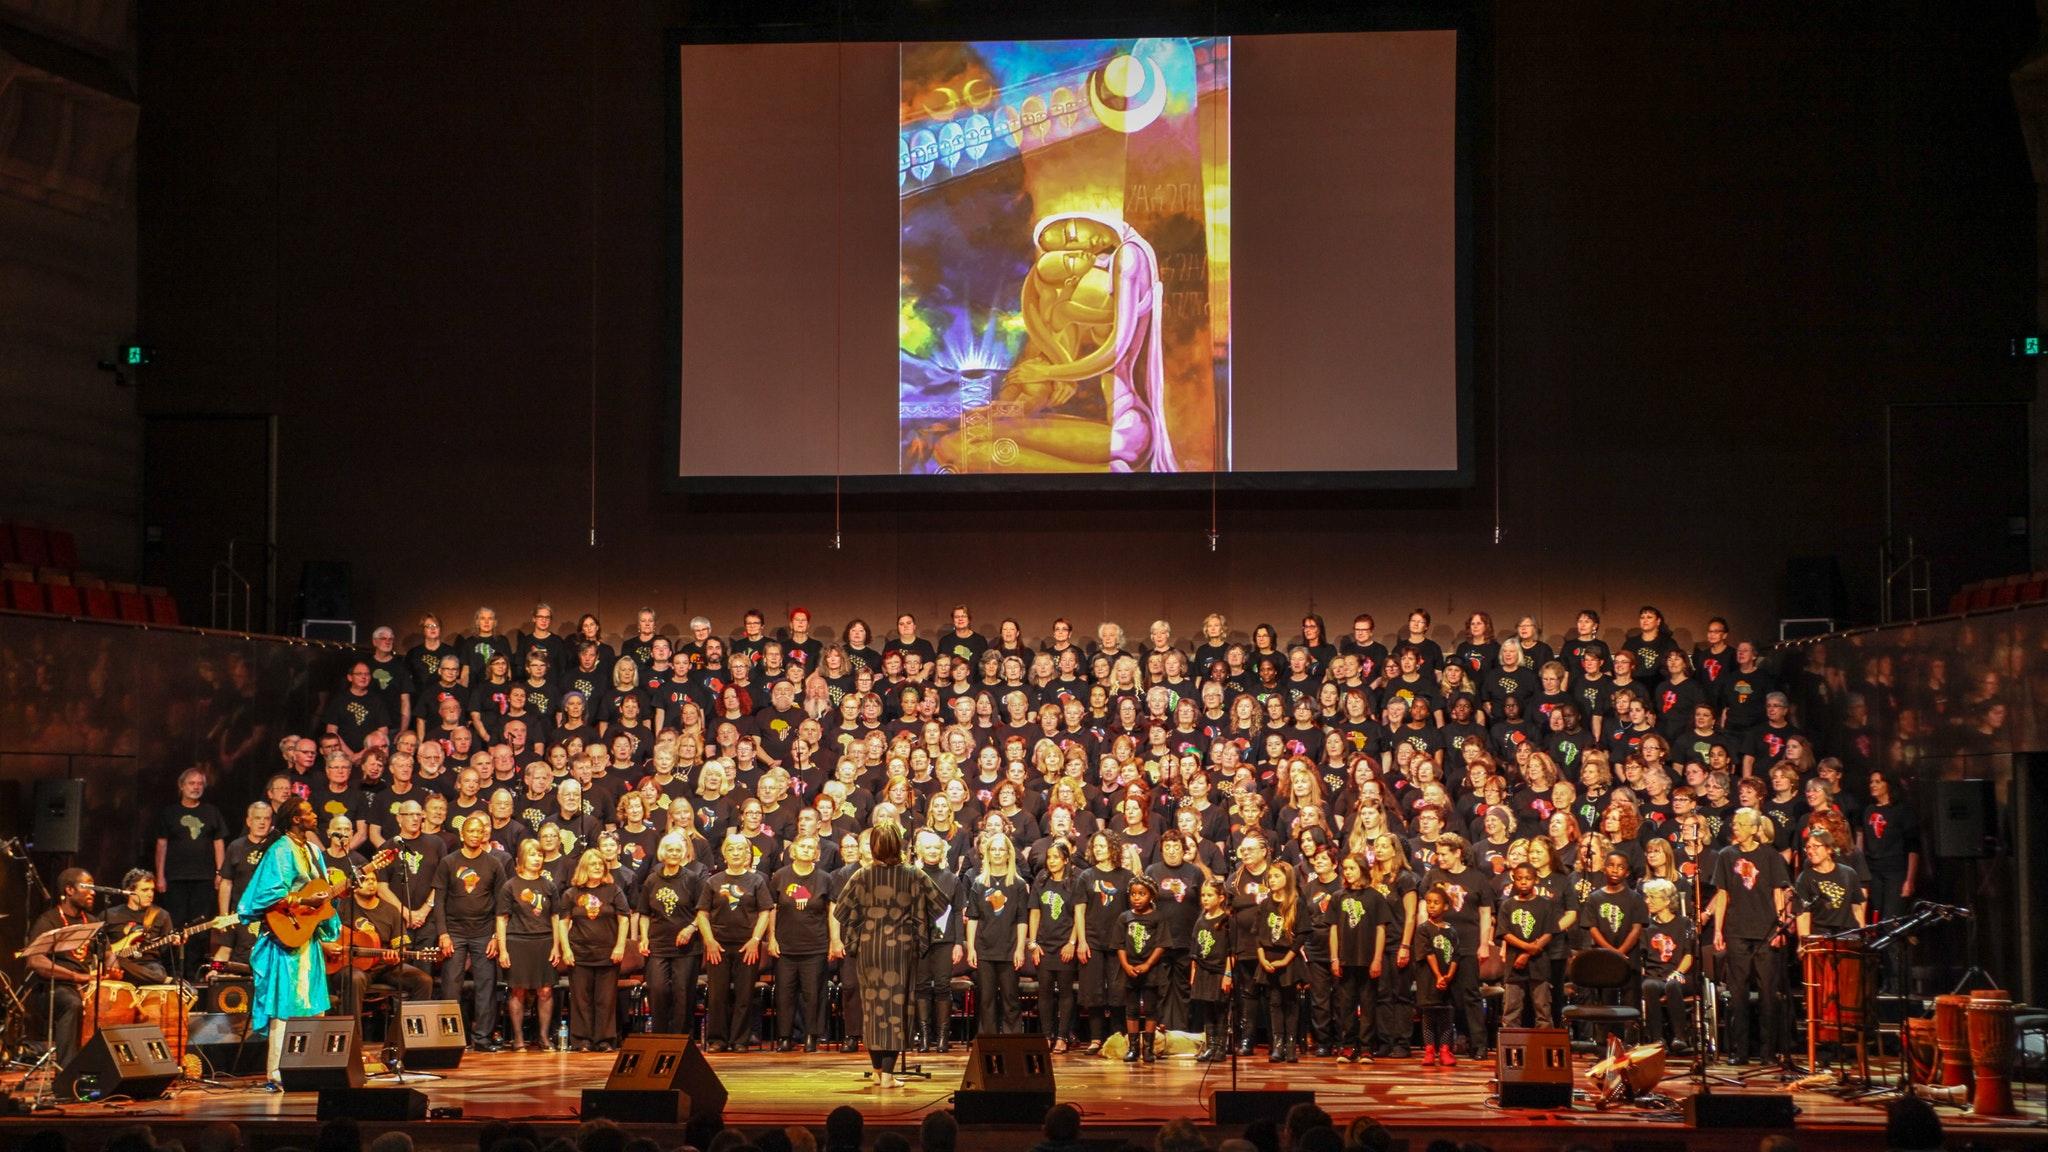 The Boite Millennium Chorus, One Africa